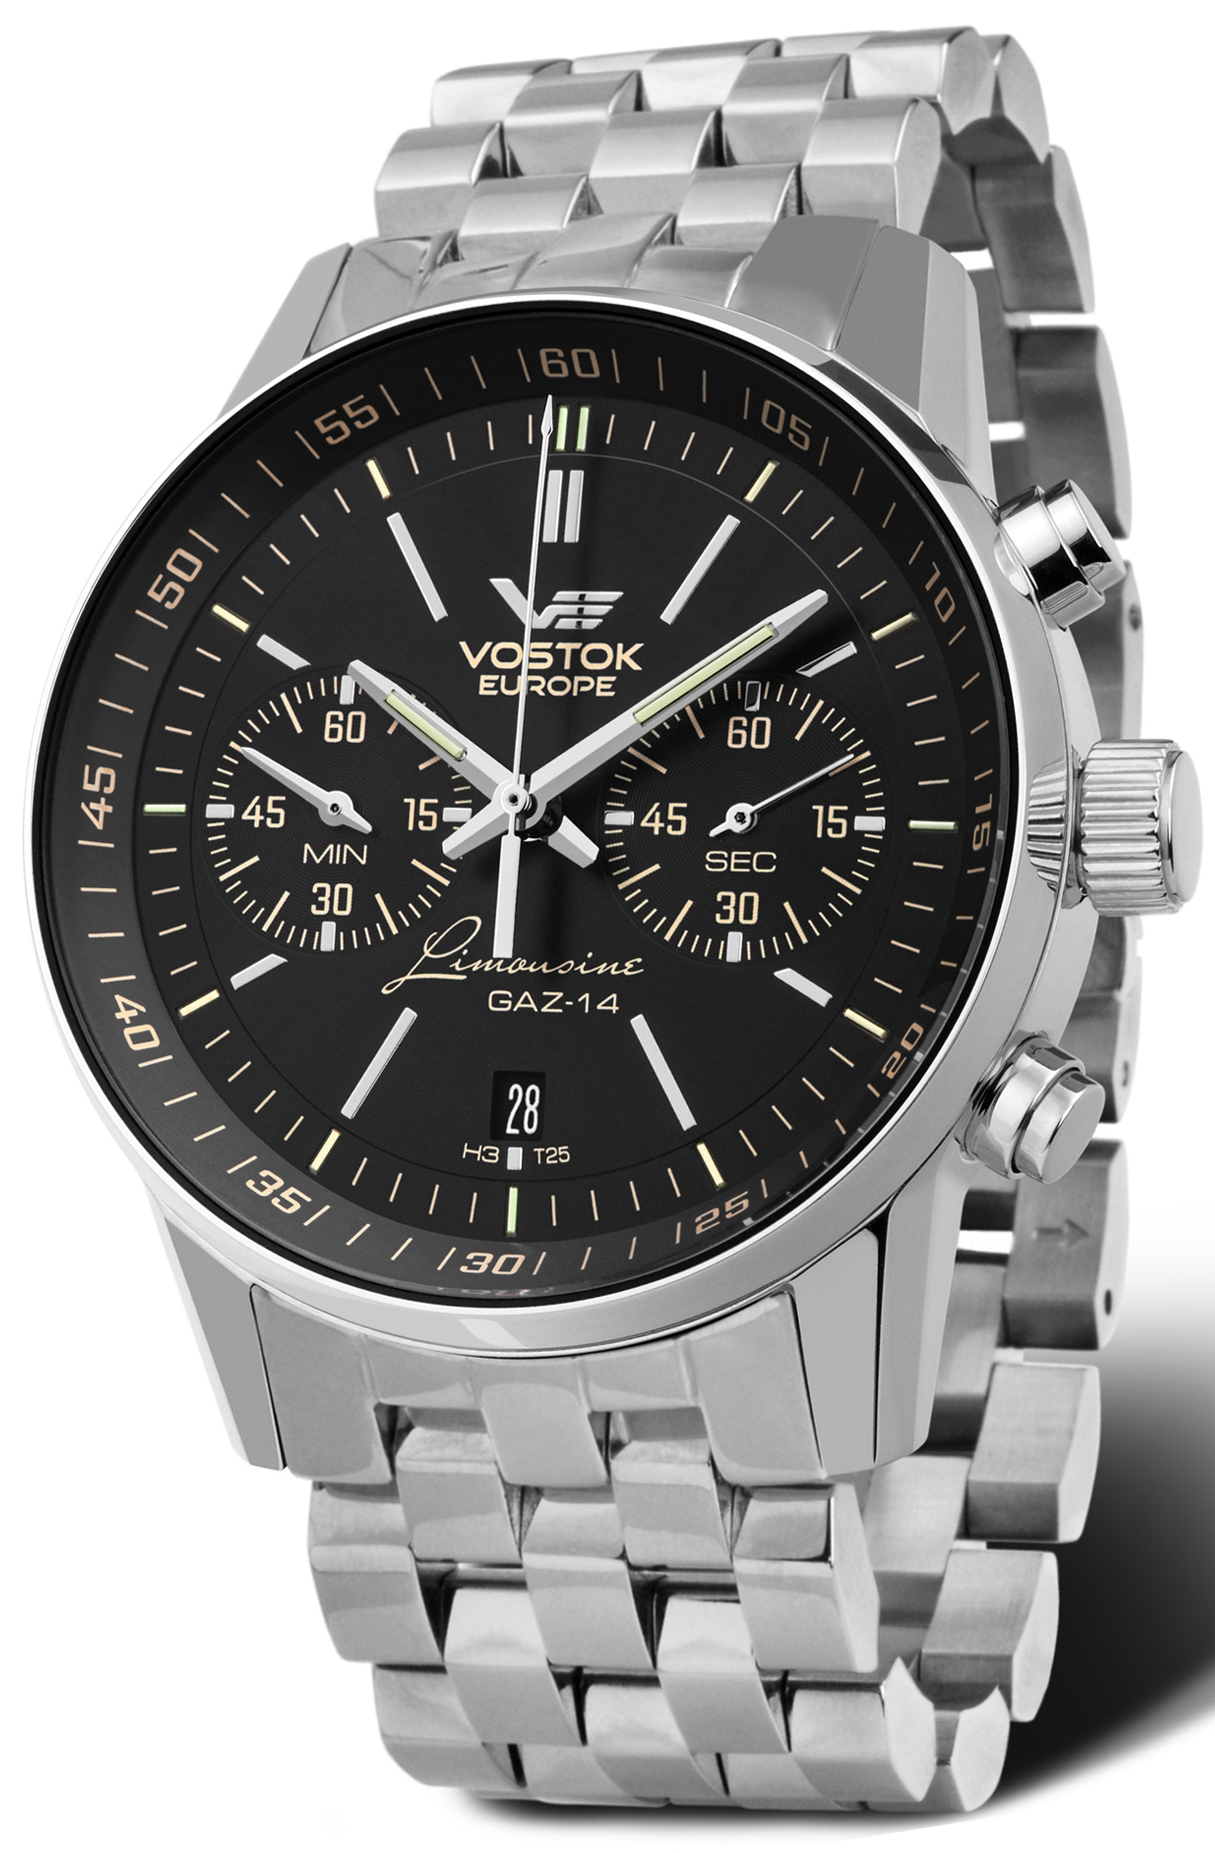 zegarek męski VOSTOK EUROPE Gaz-14 Limousine 6S21-565A599